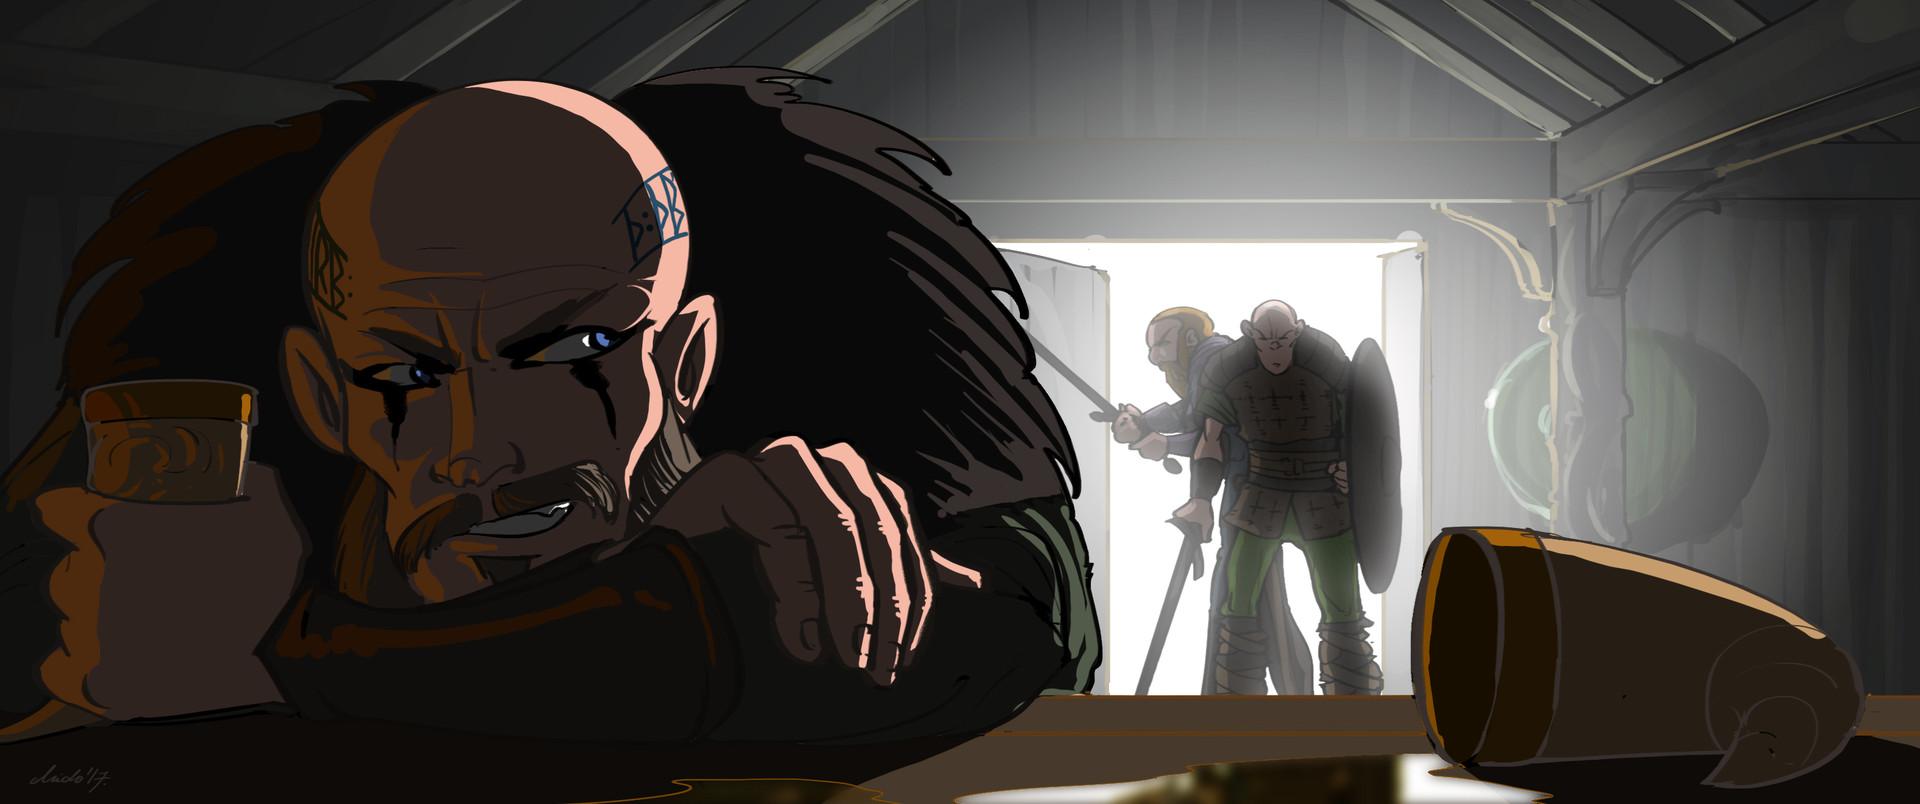 Midhat kapetanovic vikings cartoon 01